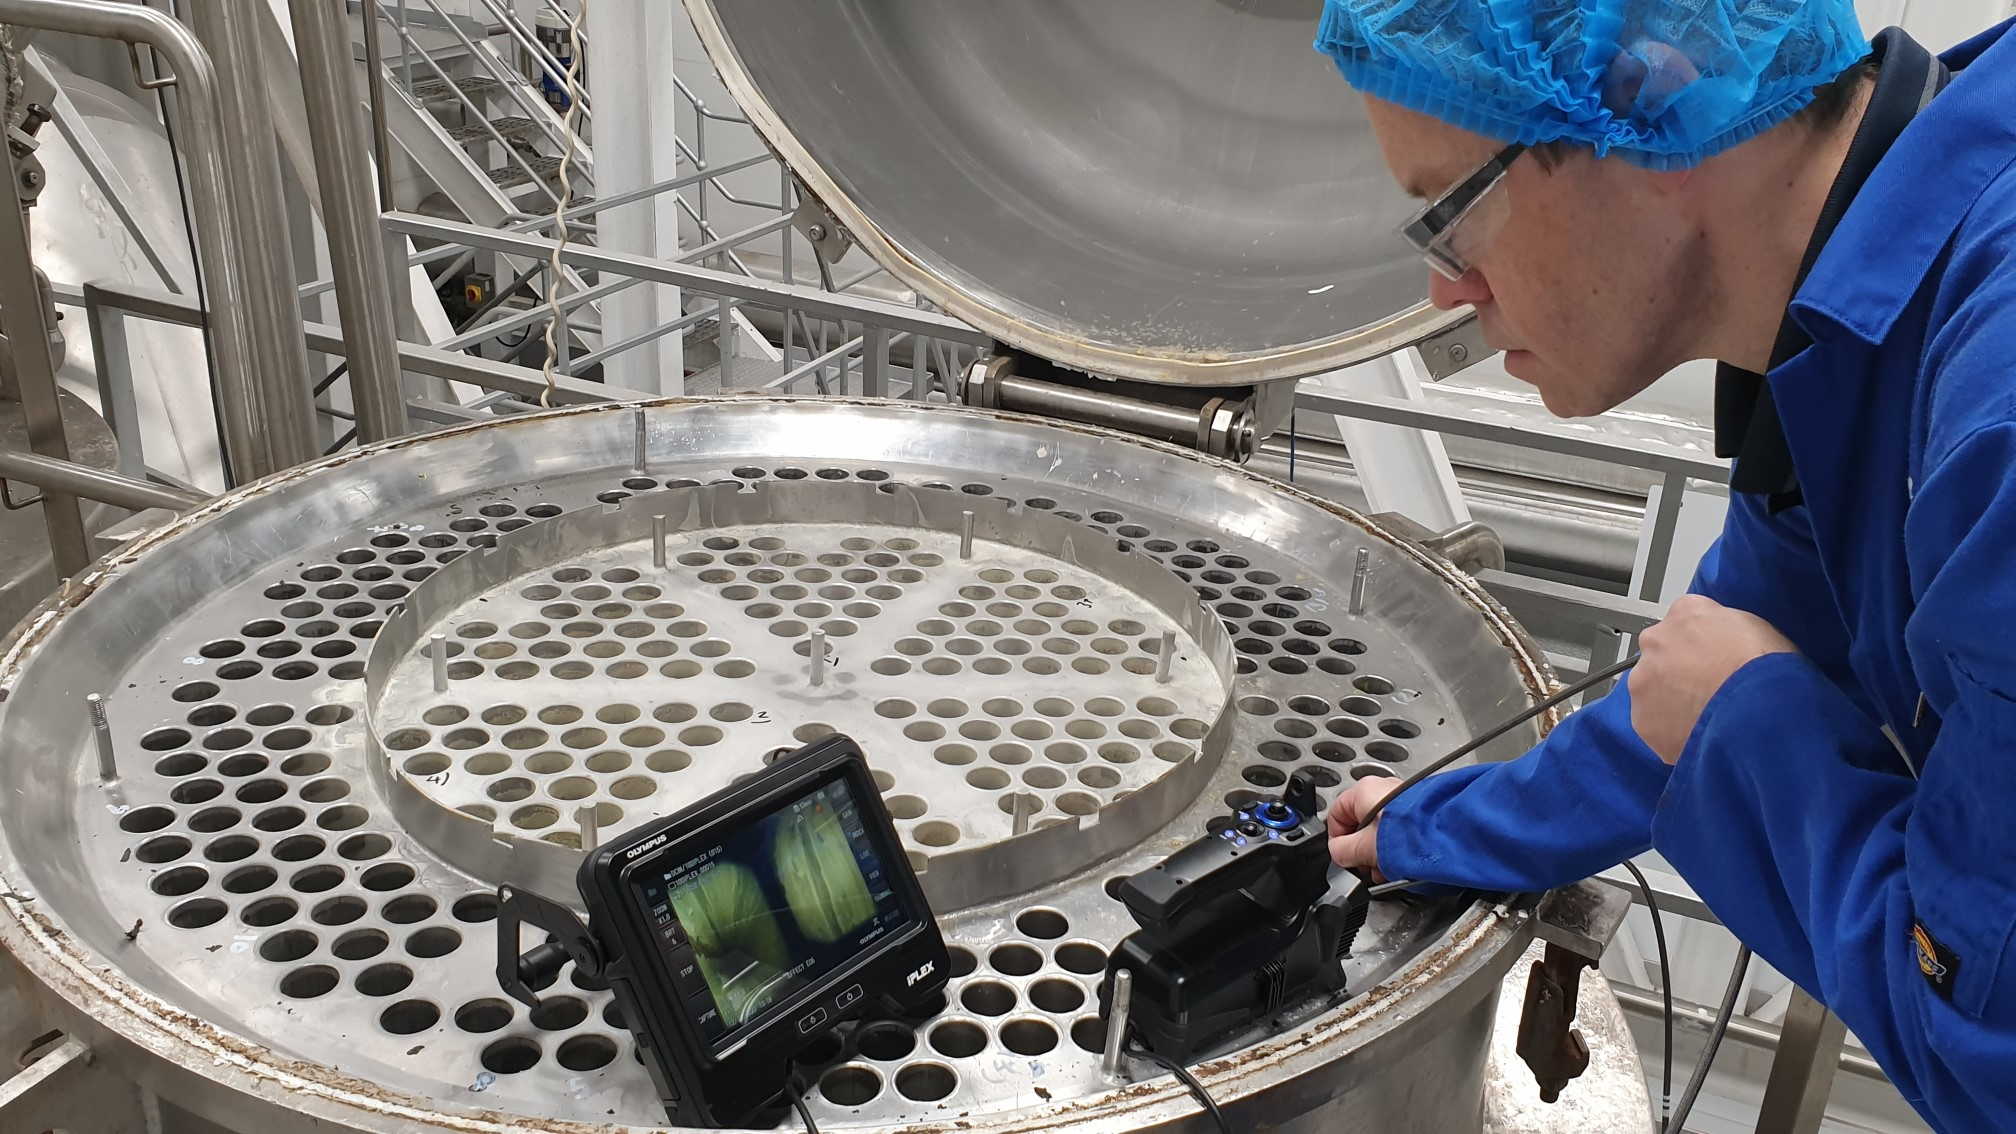 Heat exchanger, evaporator and condenser tube bundle inspection using video endoscope uv equipment and innovative testing methods